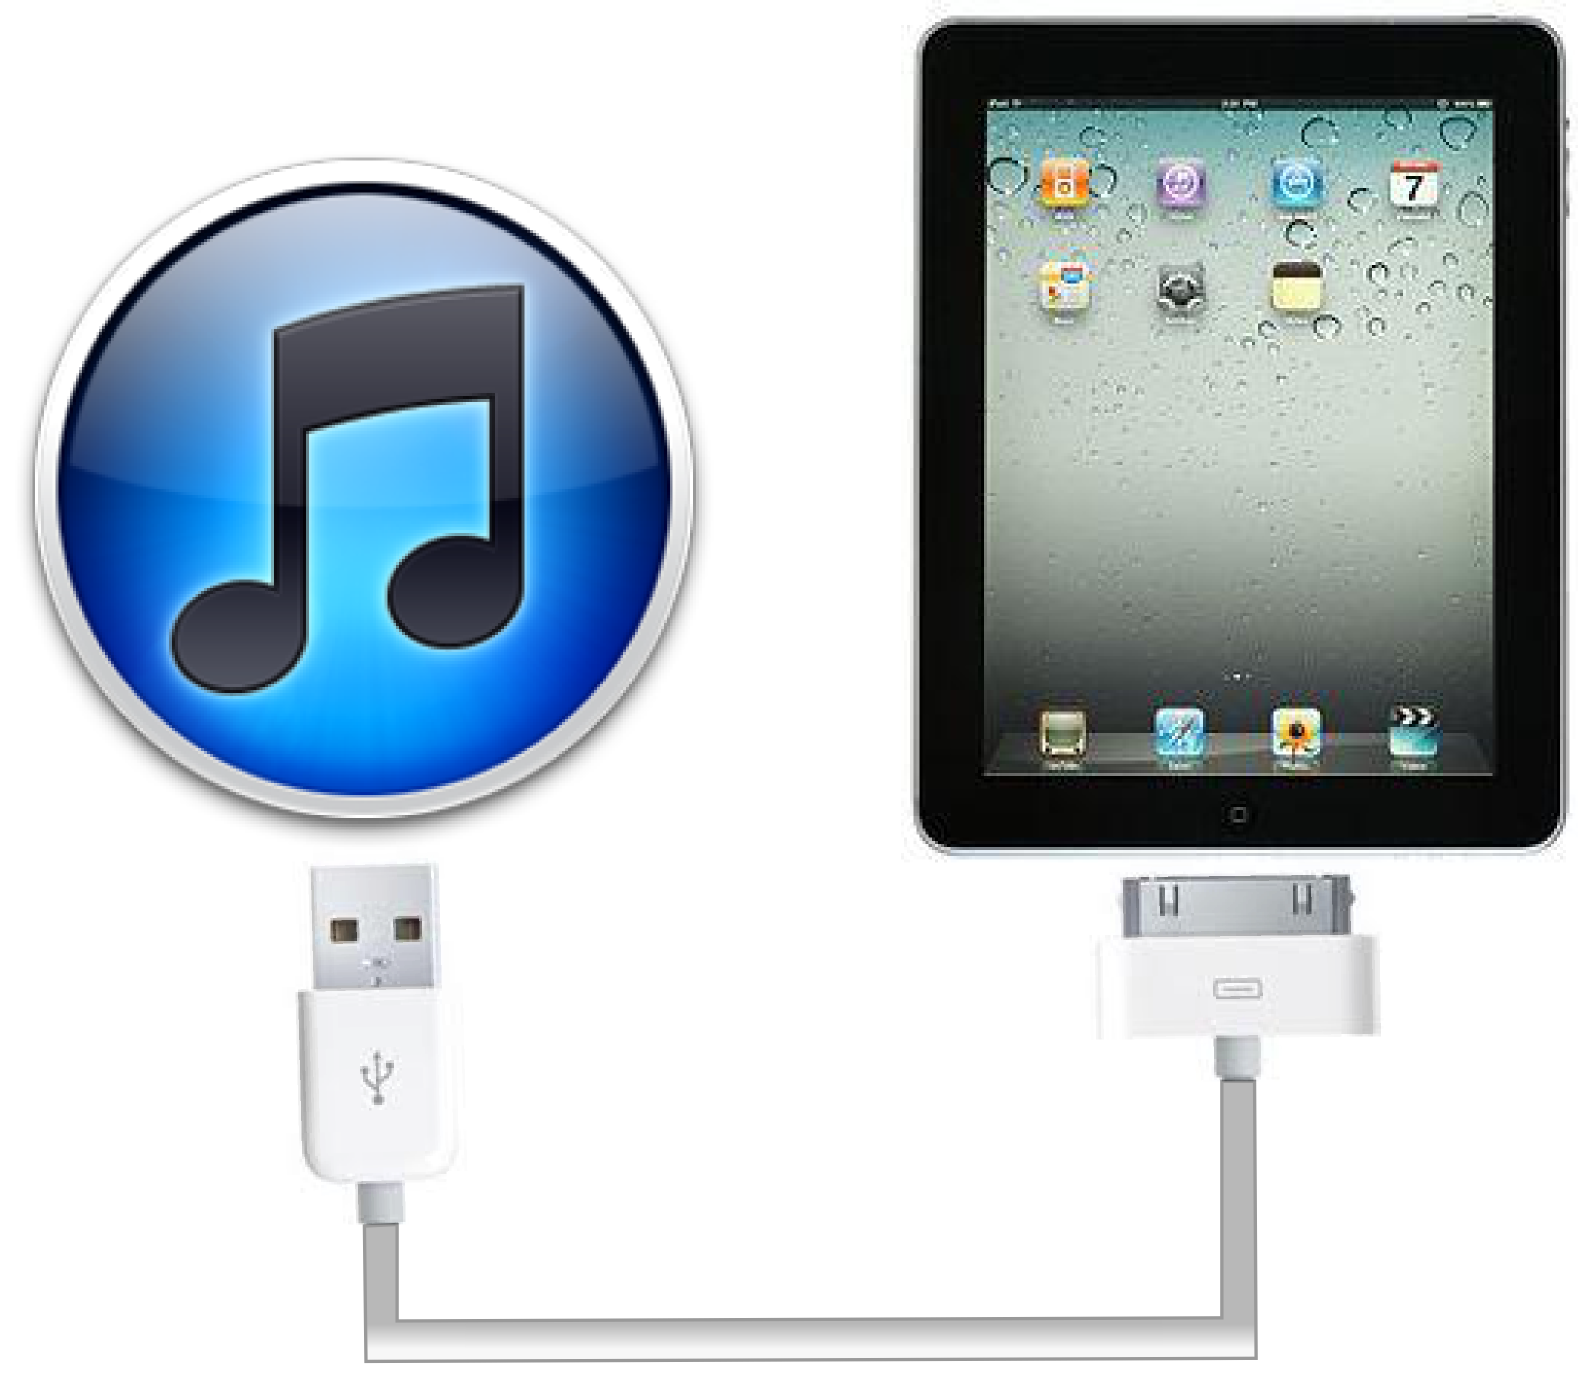 Jailbreak iOS 11 / iOS 12 Using Electra on iPhone, iPad, iPod touch